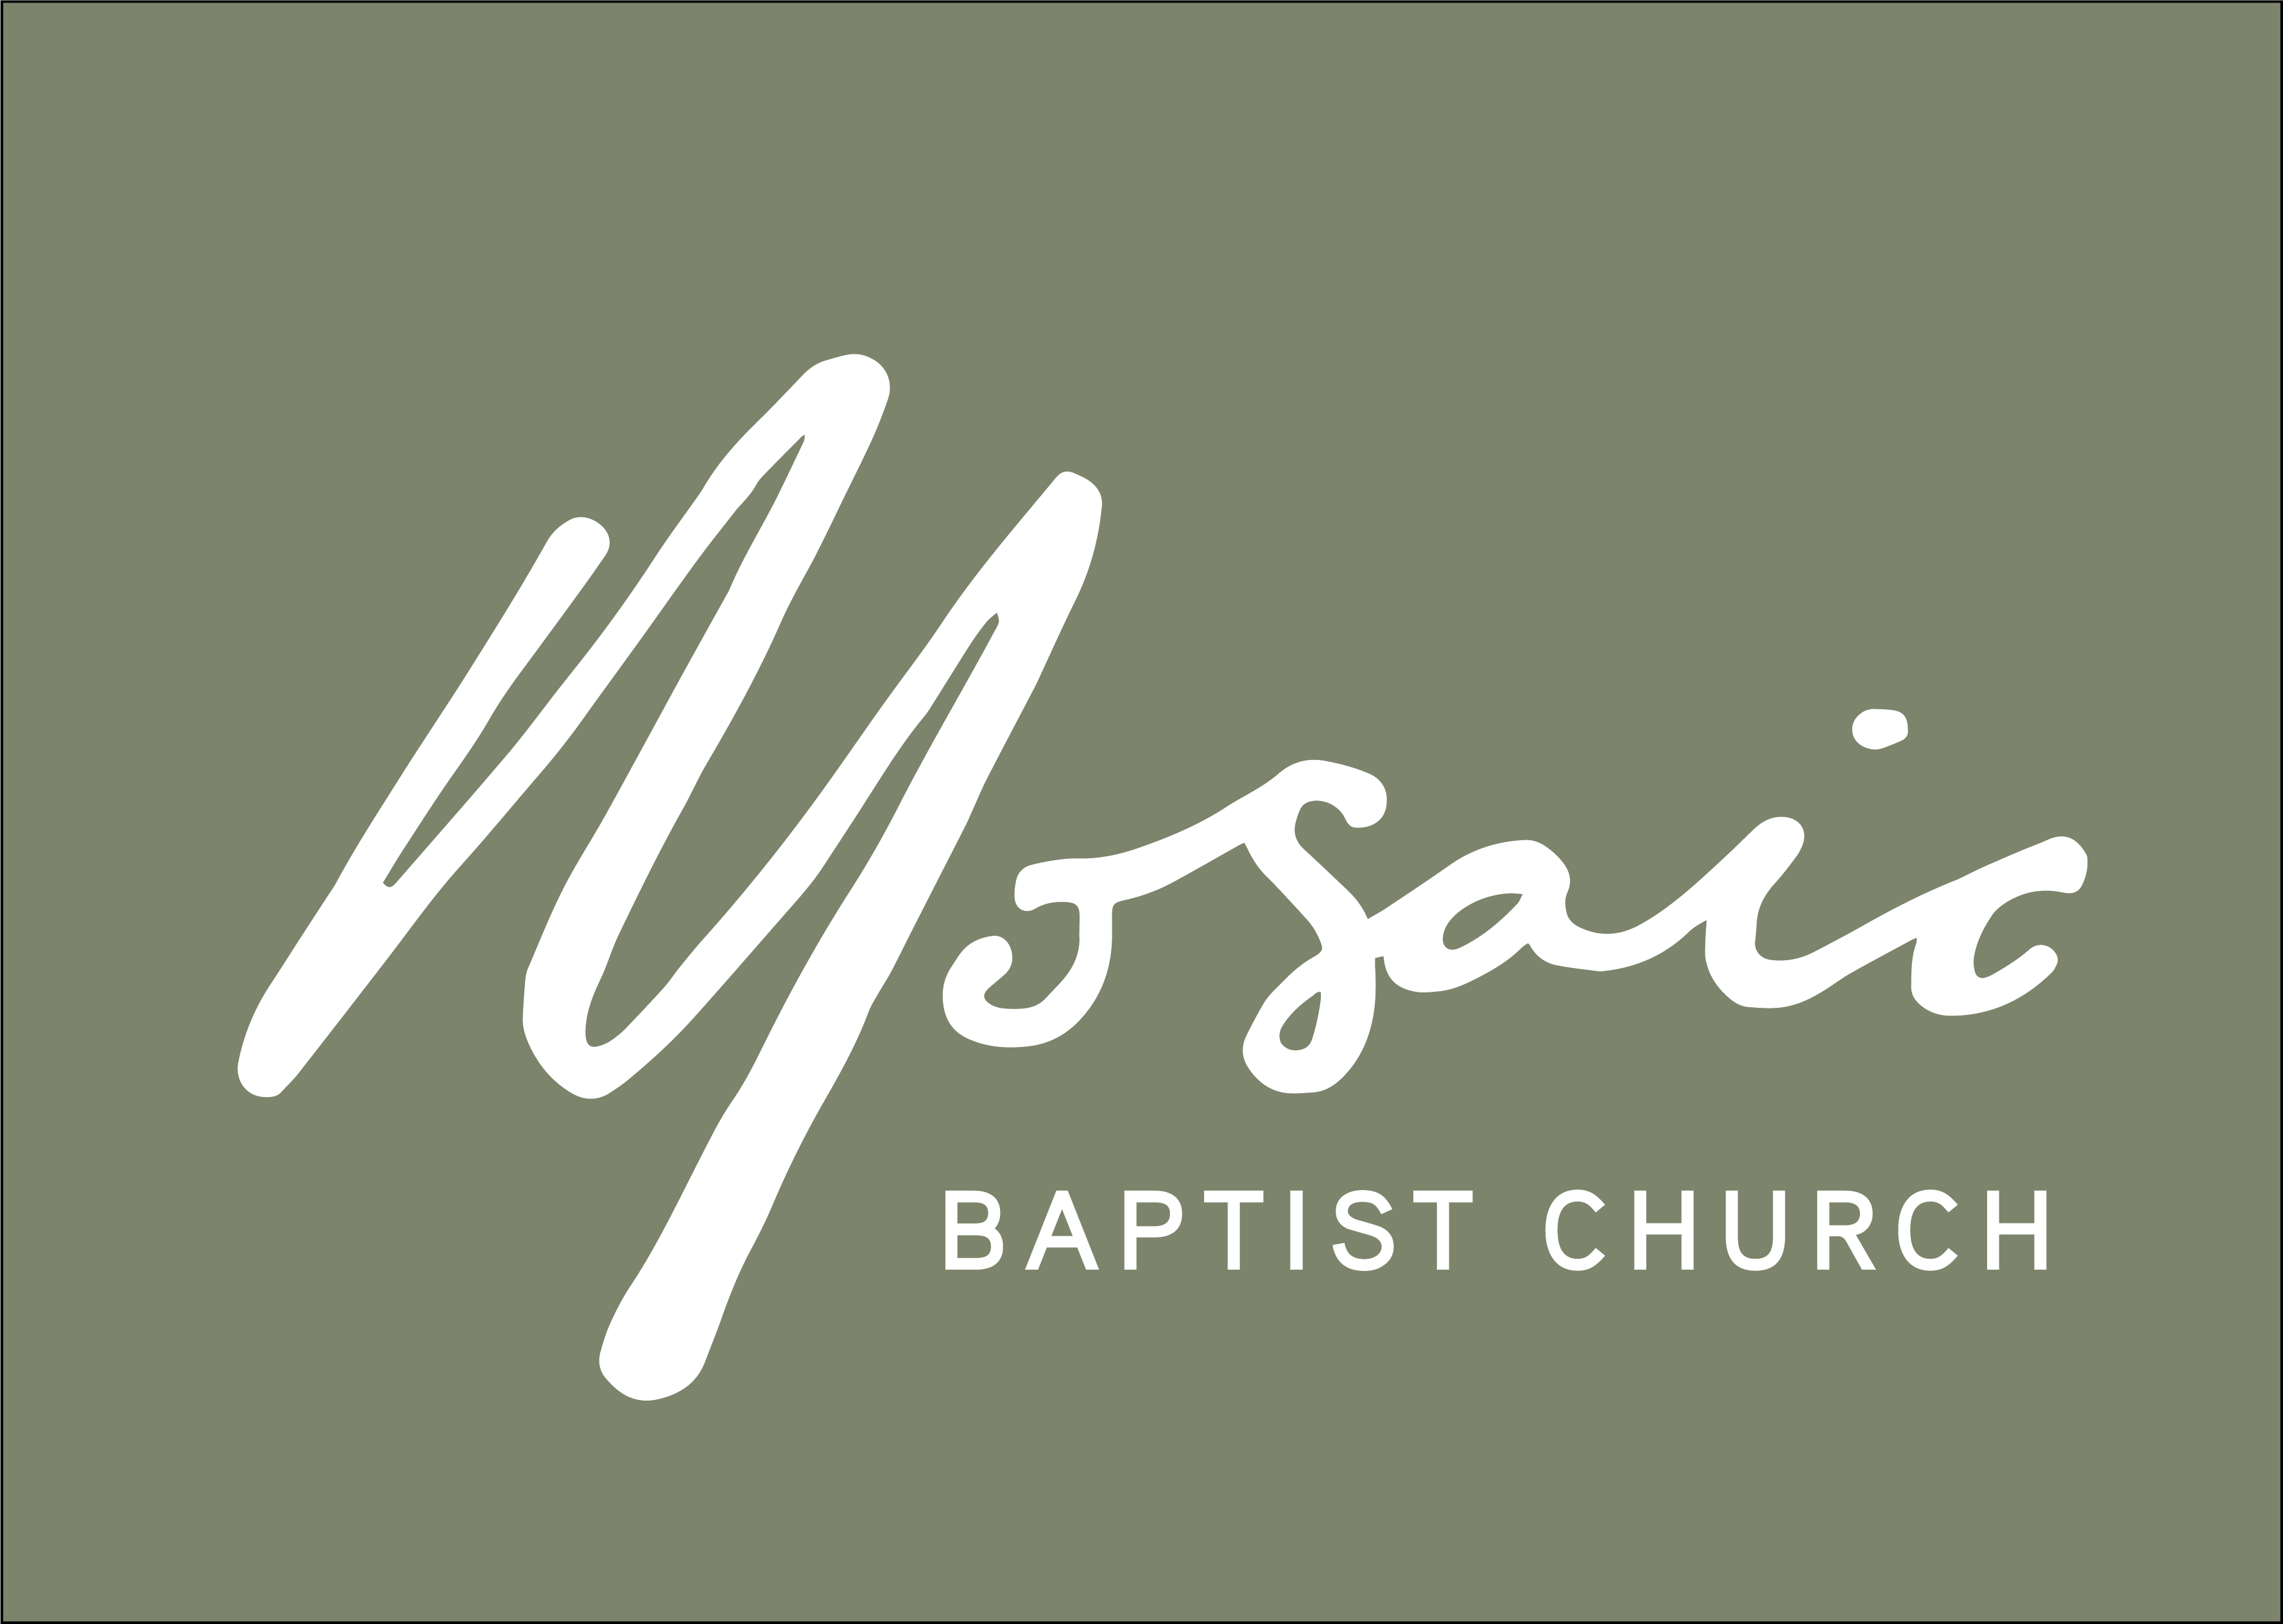 image of the dark green Mosaic logo